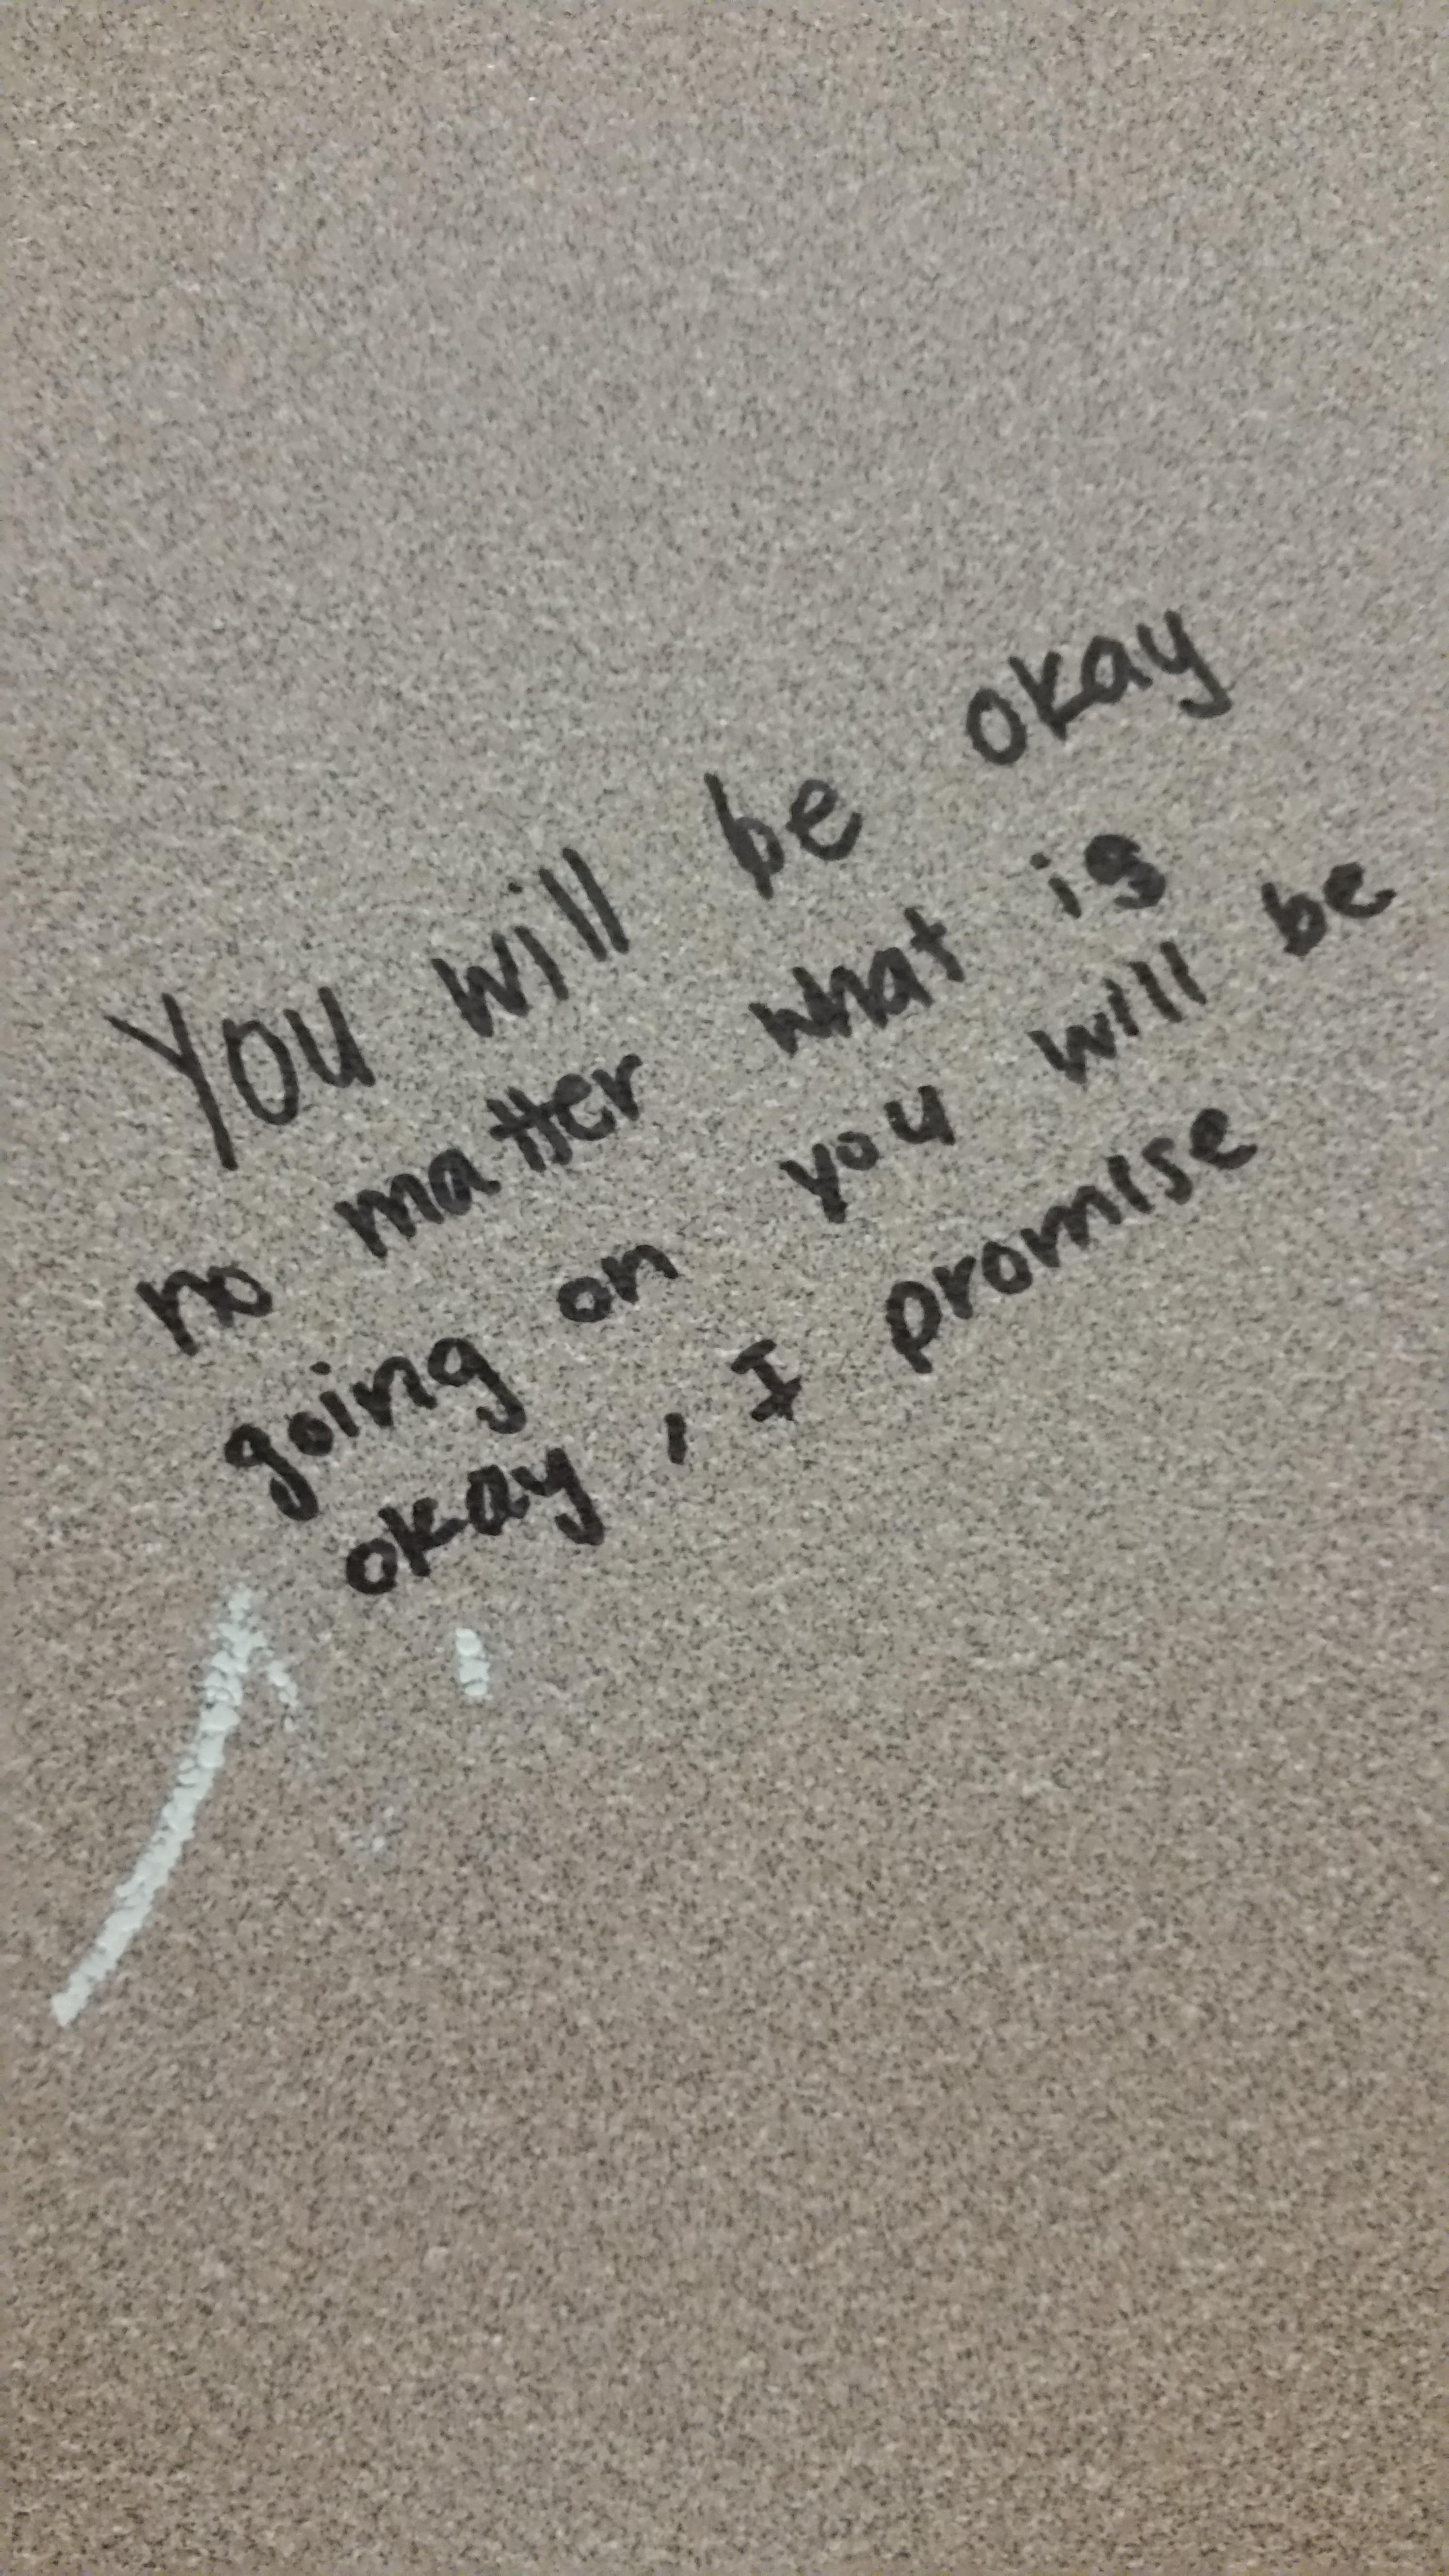 Graffiti in SG bathrooms brings positivity